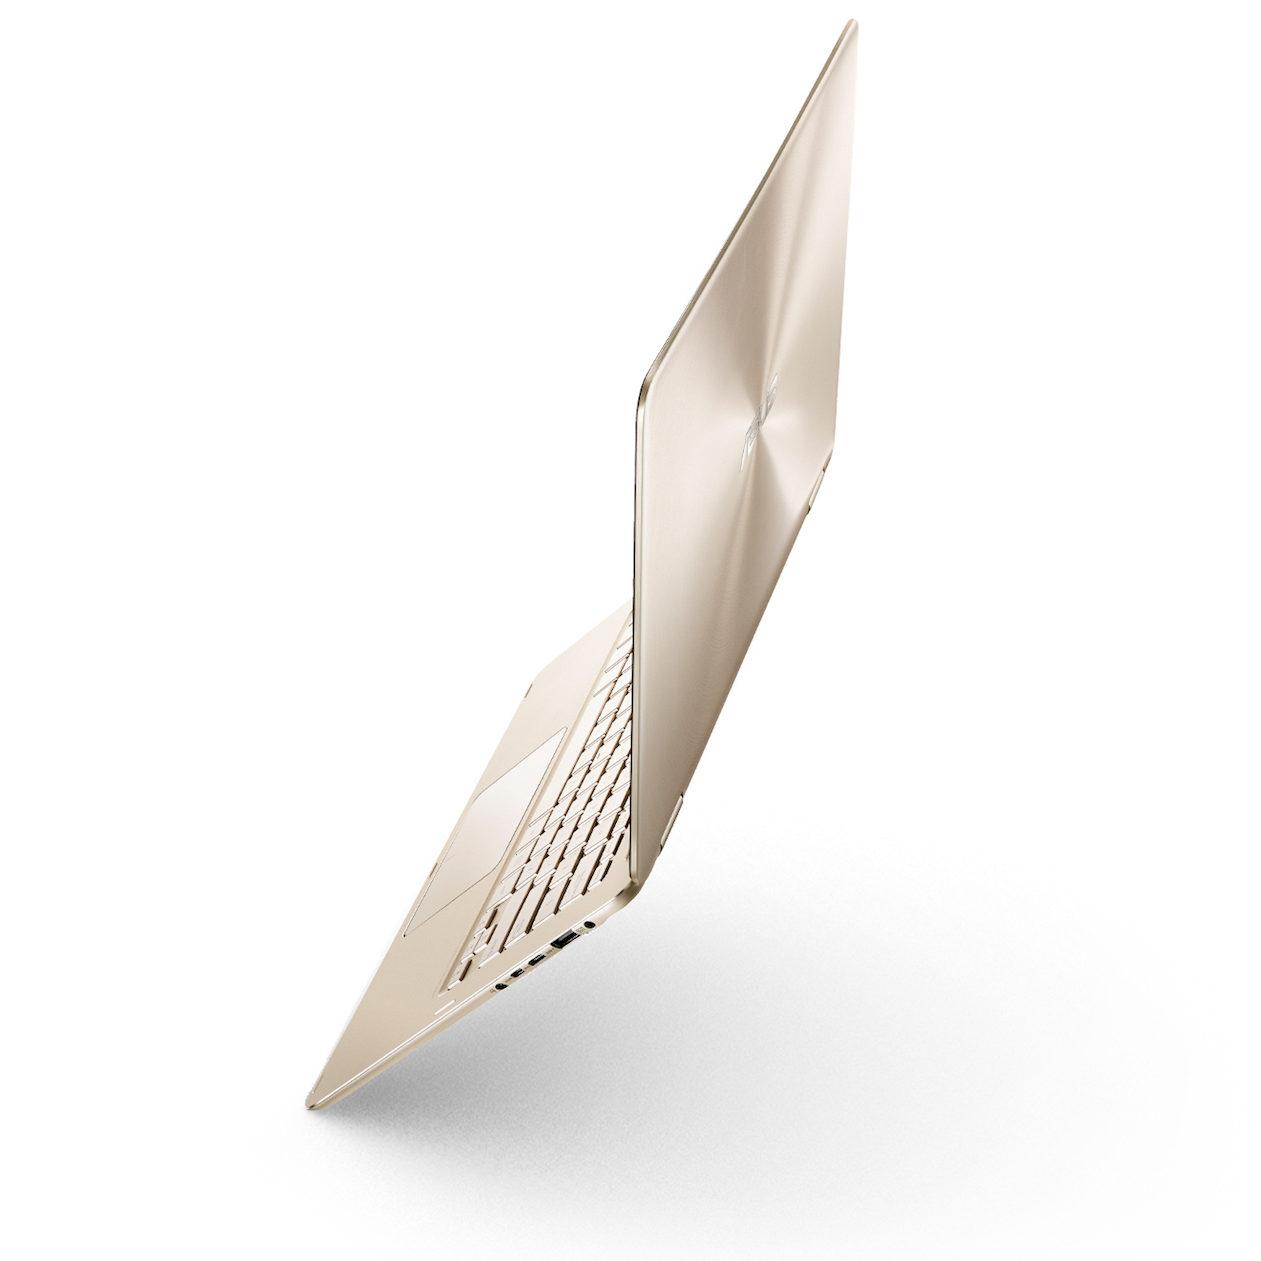 Cancelli srl_laptop